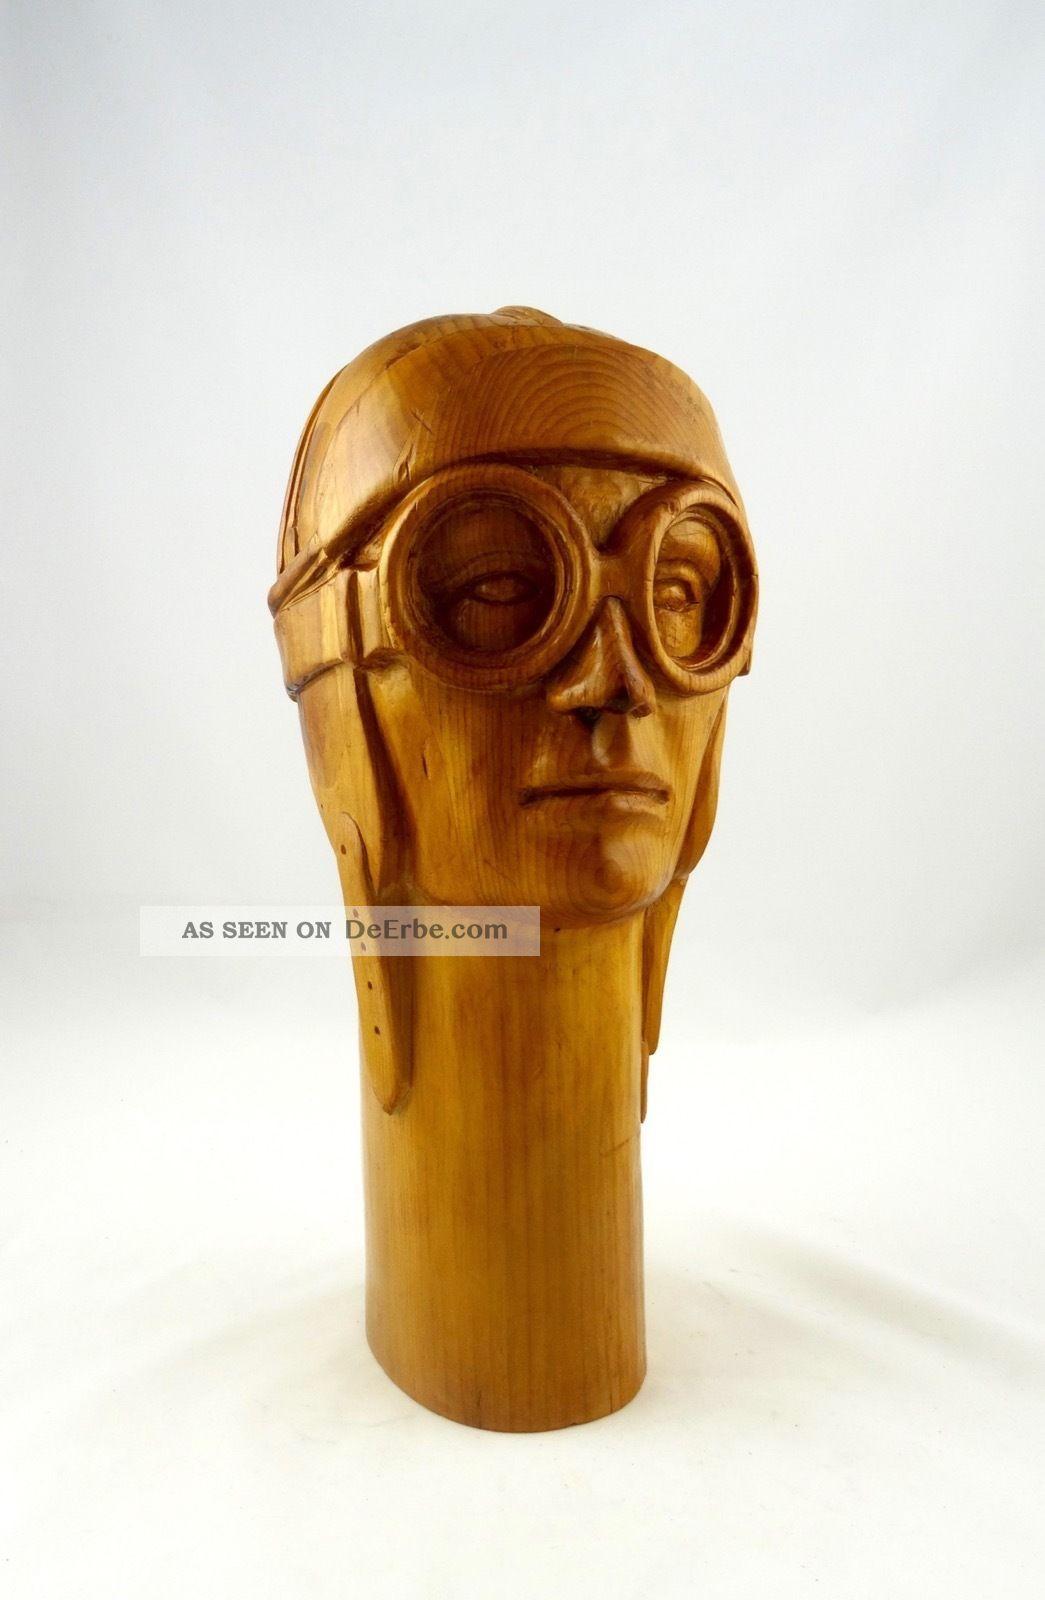 Große Art Deco Flieger Skulptur Handgeschnitzt Antik Fliegerei Pilot BÜste Holz 1920-1949, Art Déco Bild